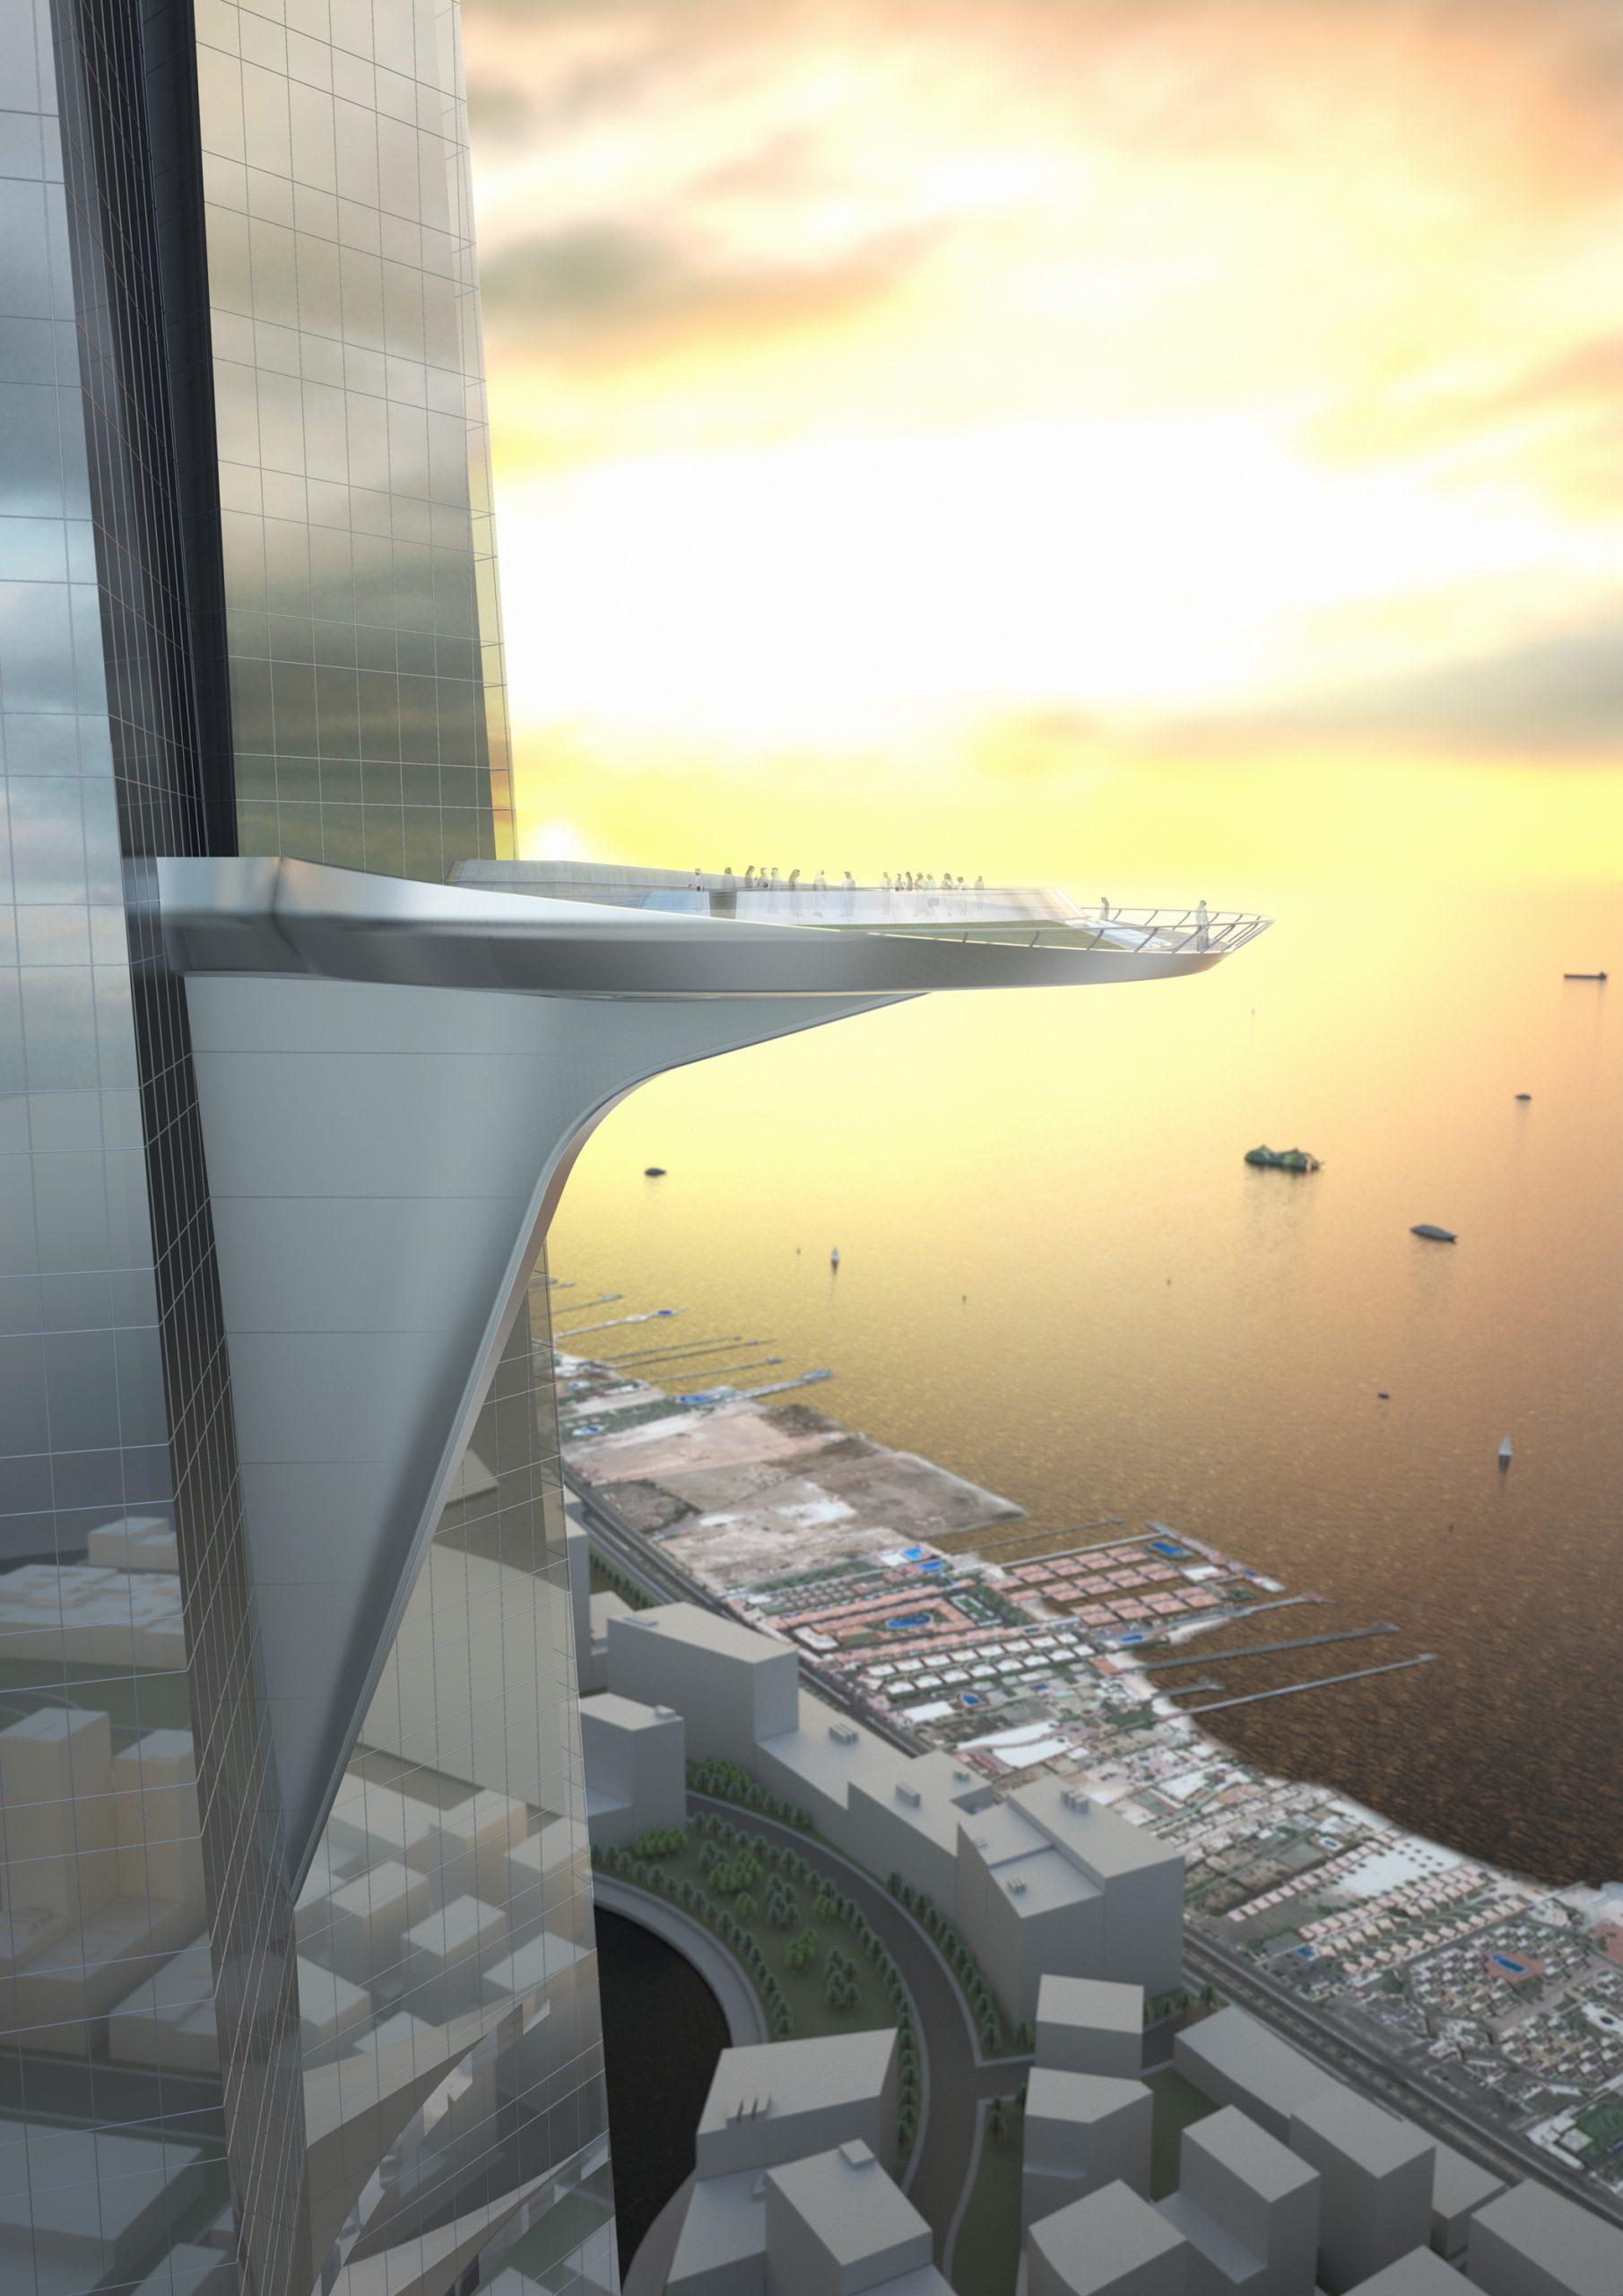 Observatory deck jeddah tower sunrise